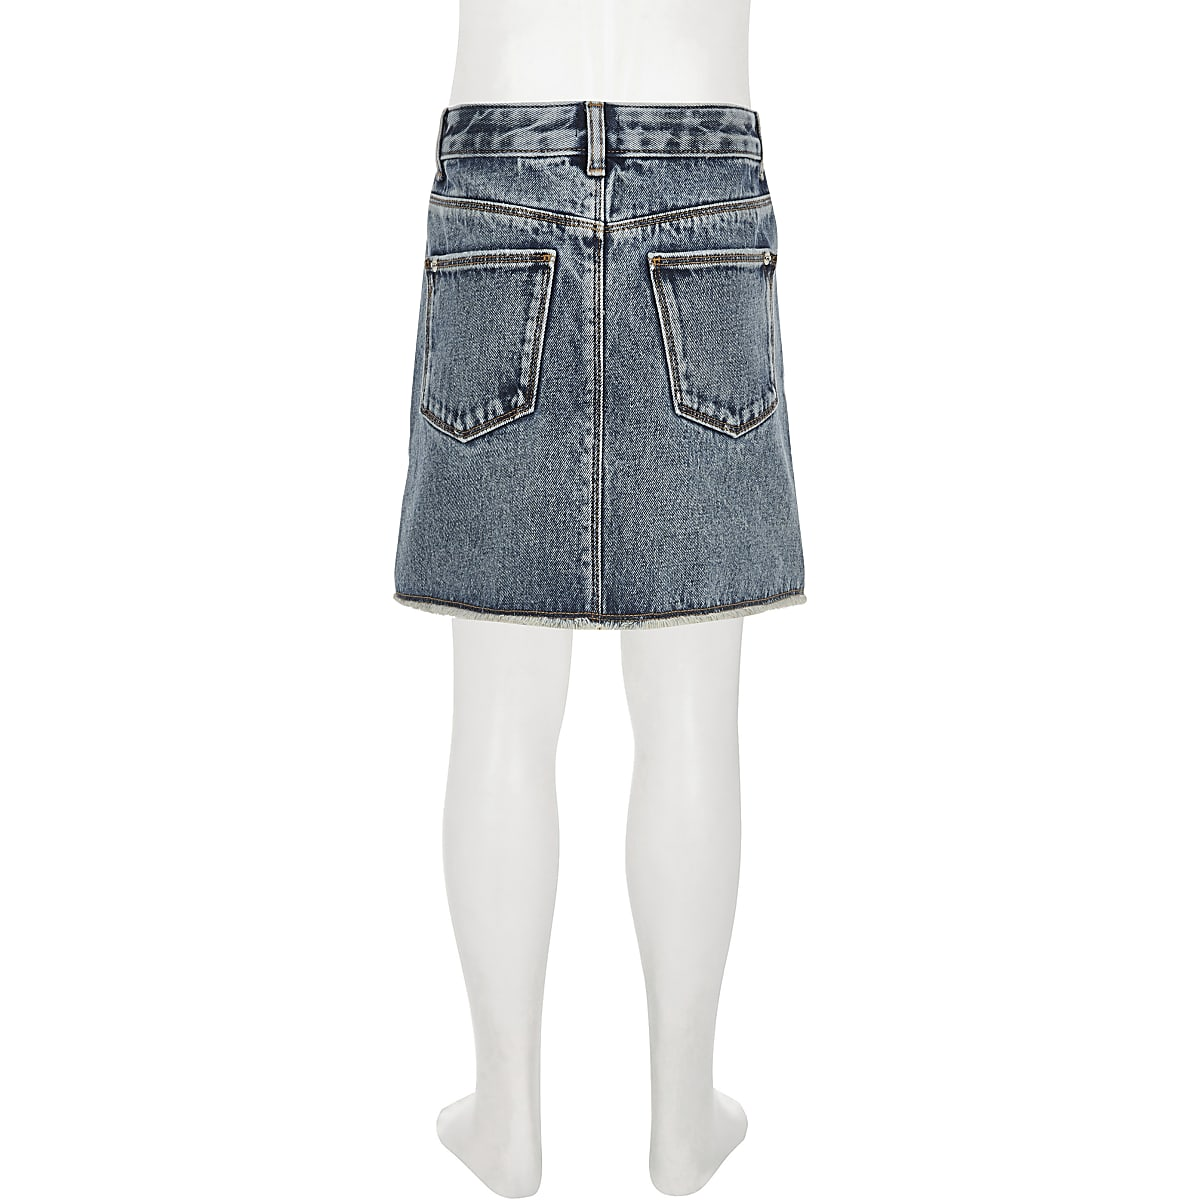 db94ed607333b2 Girls blue ripped denim skirt - Casual Skirts - Skirts - girls